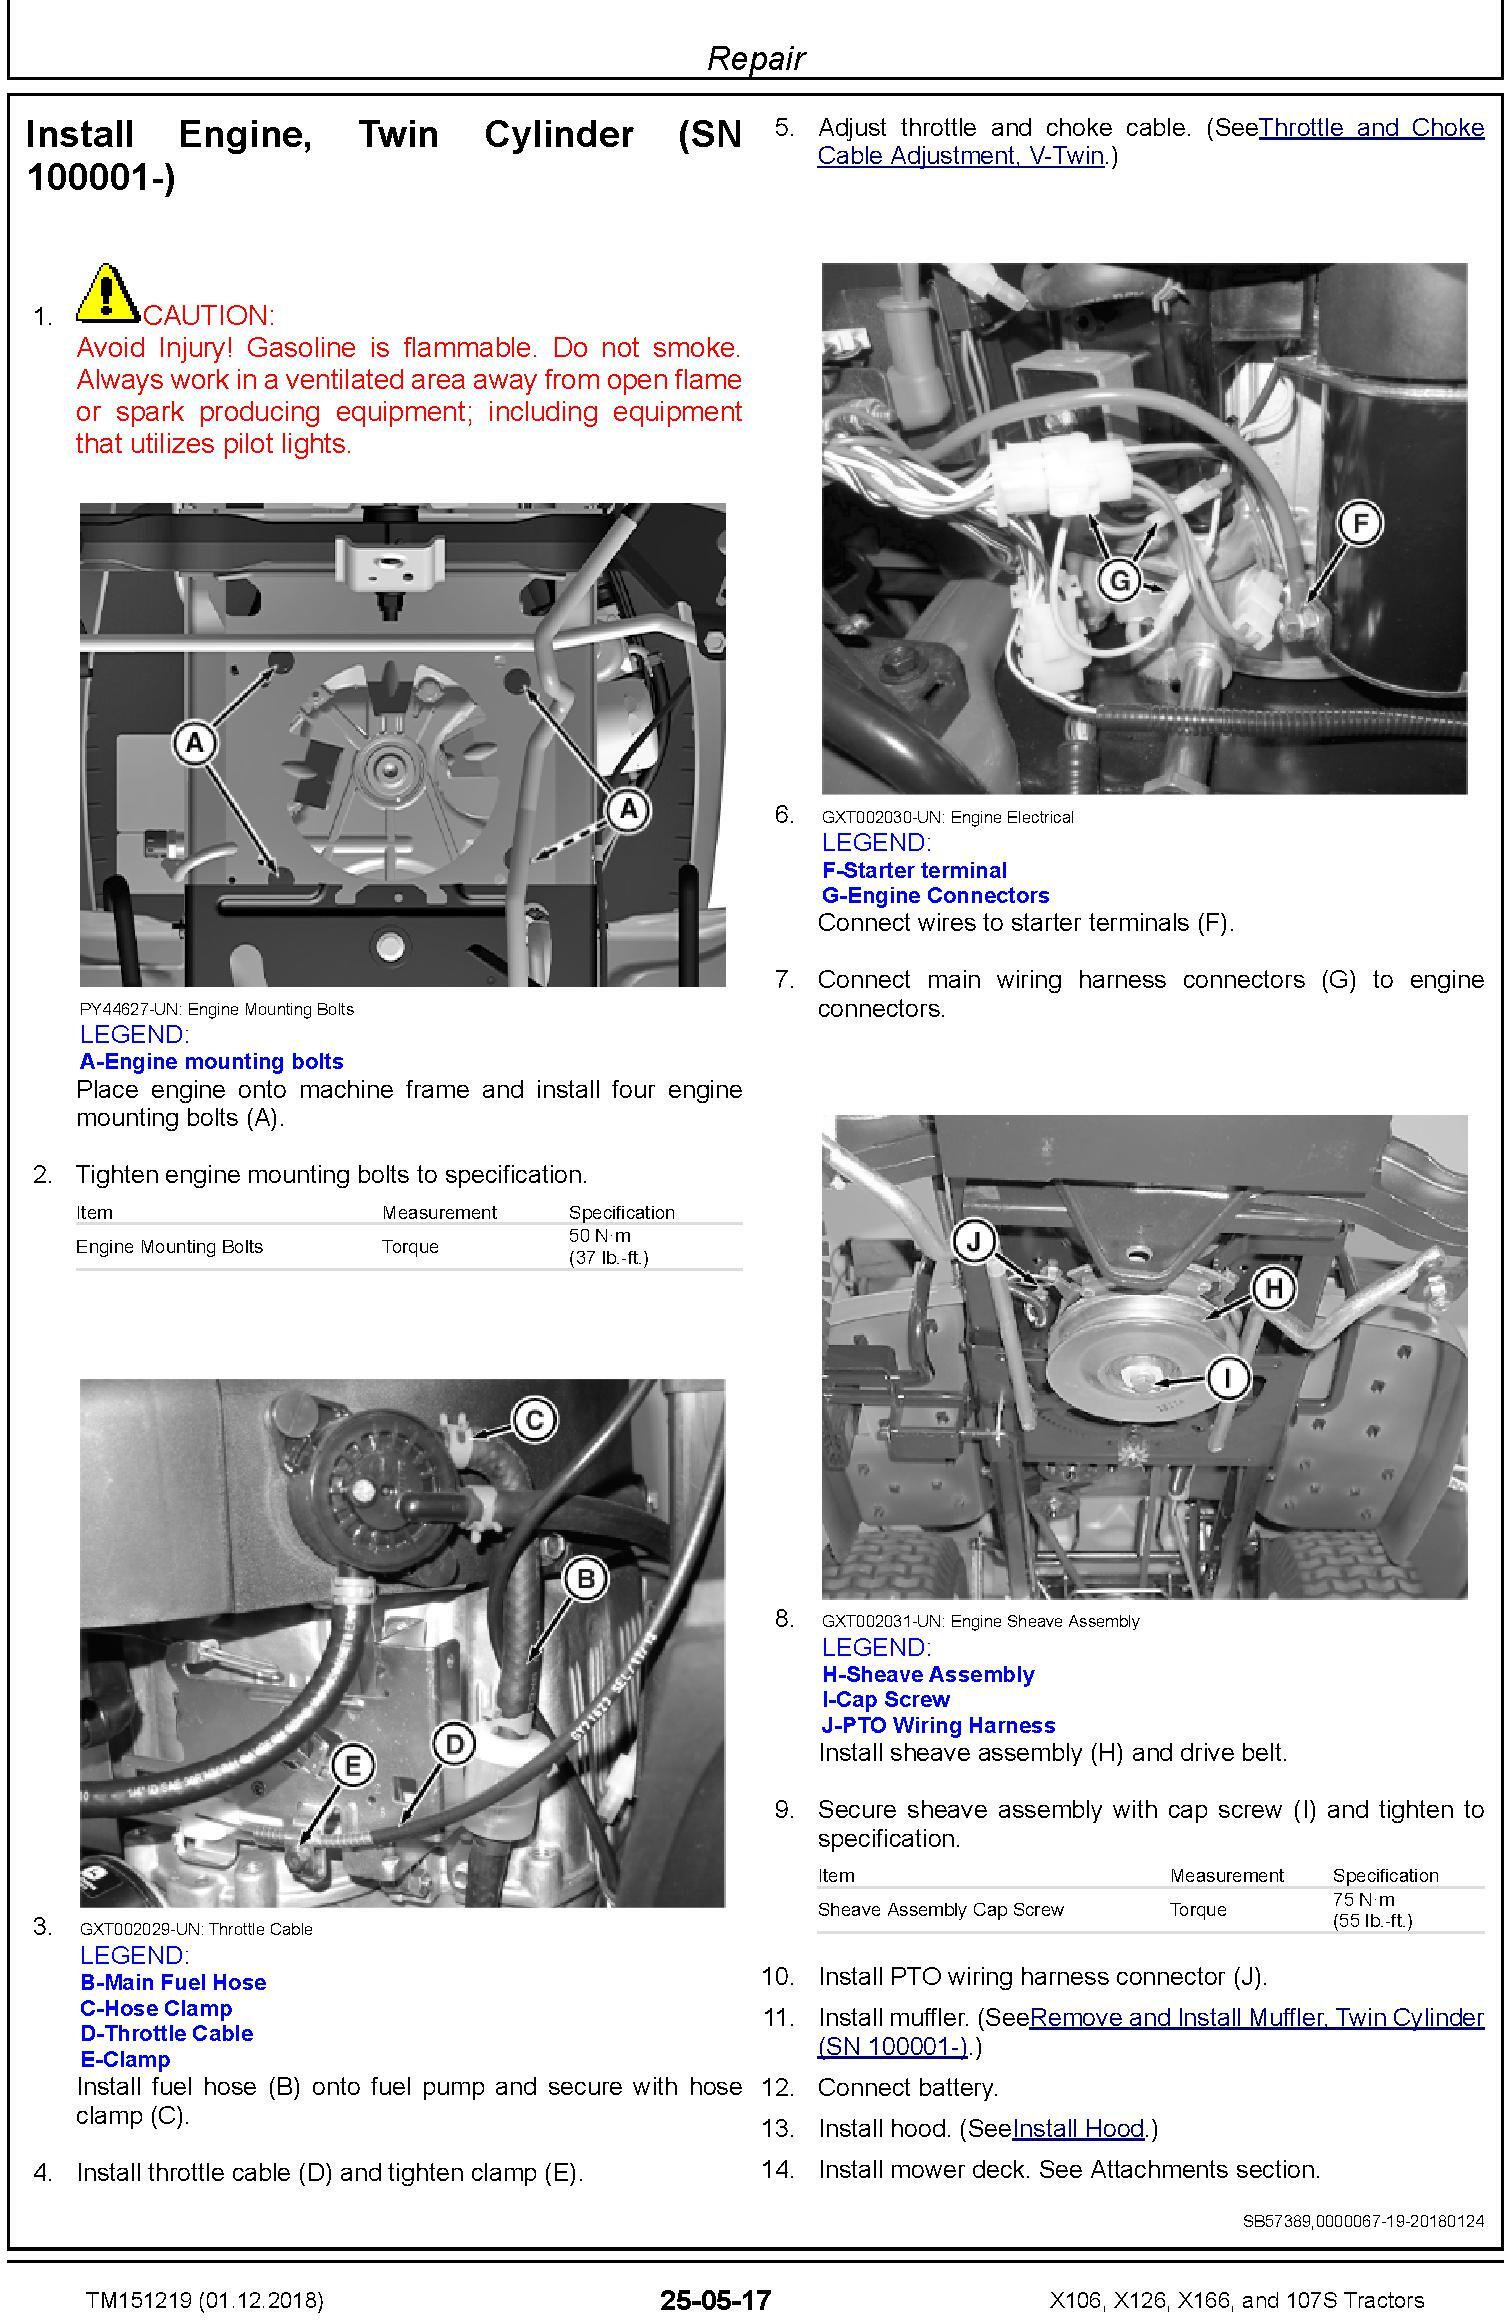 John Deere X106, X126, X166, and 107S Tractors (SN. 010001-) Technical Service Manual (TM151219) - 3